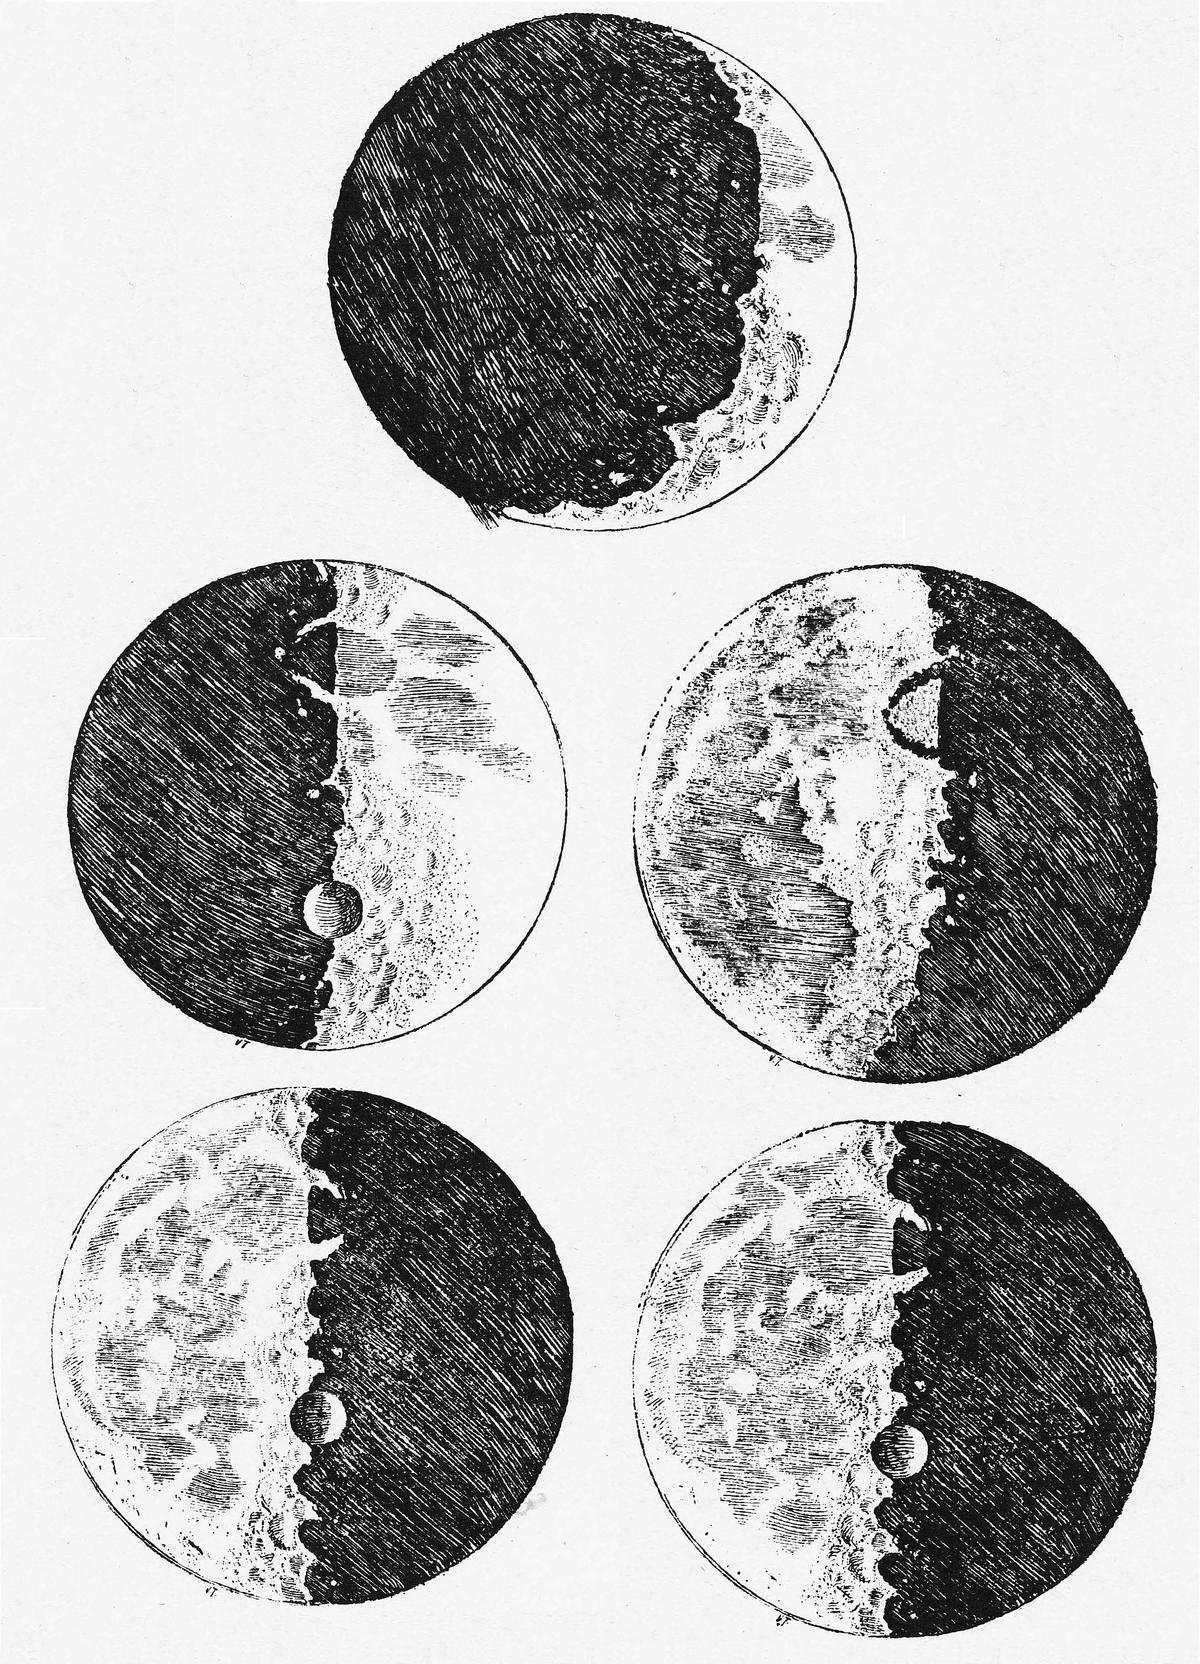 Galileo's Drawings and Writings